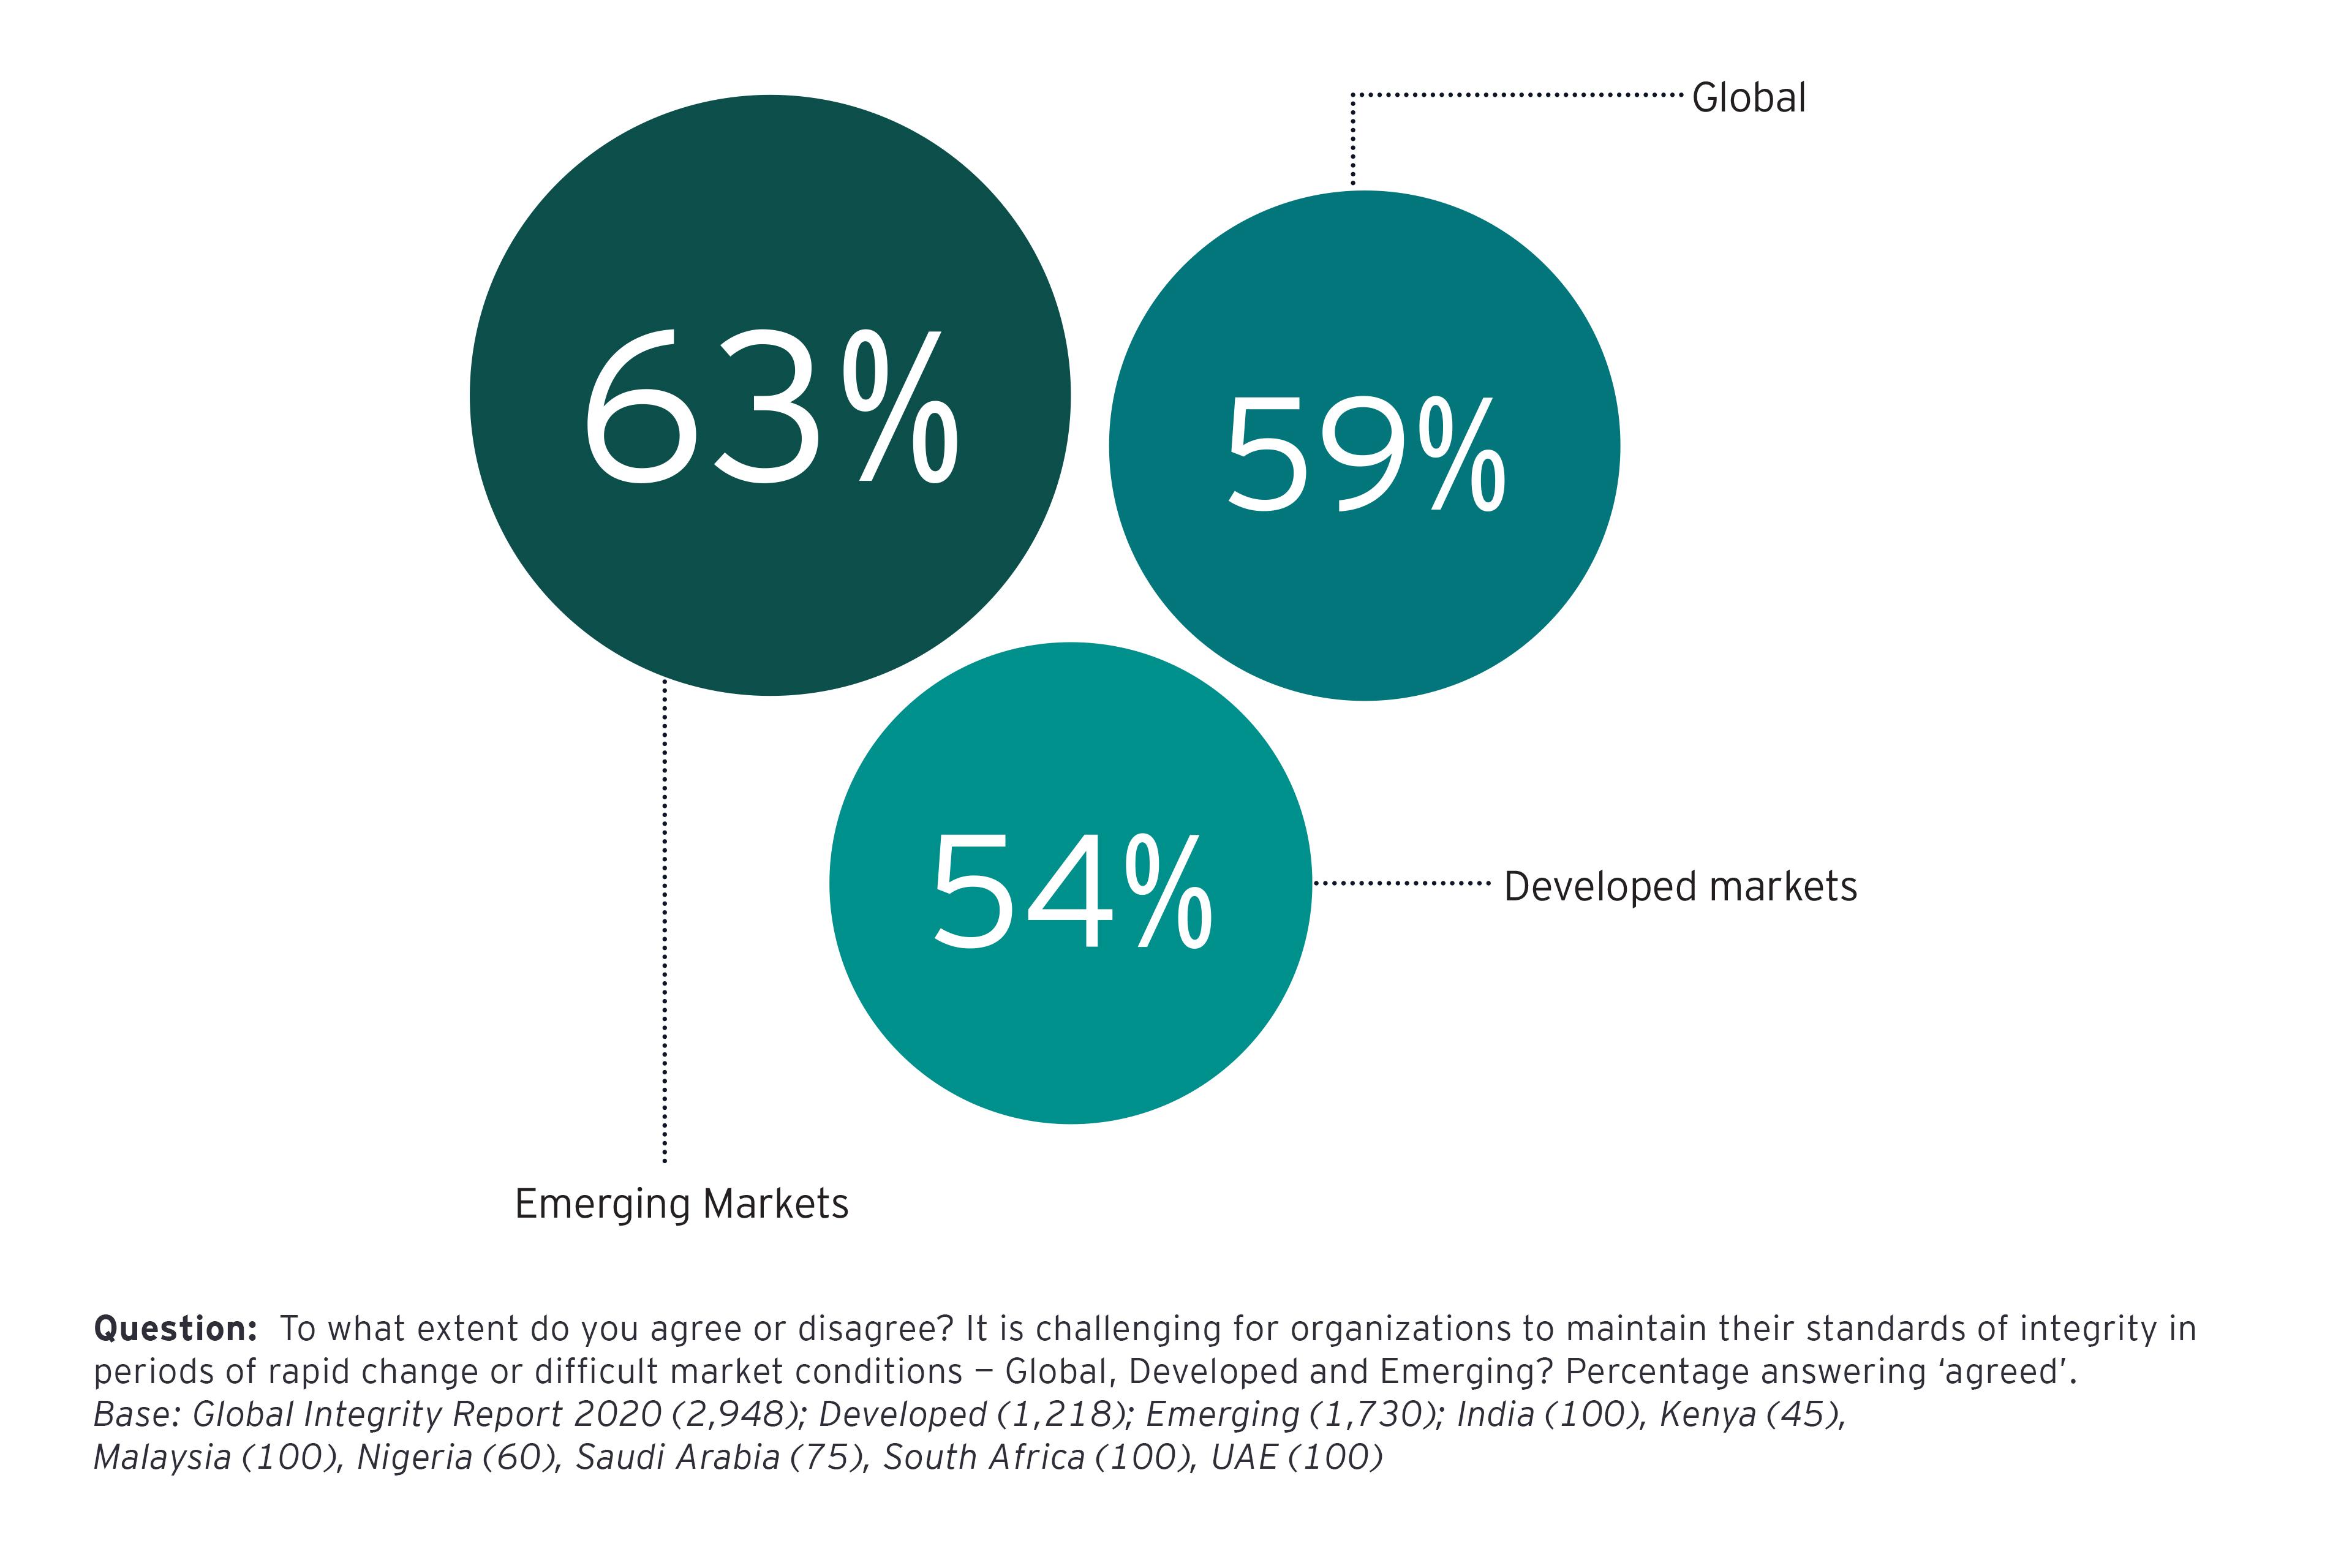 Comparison of Emerging, Developed markets